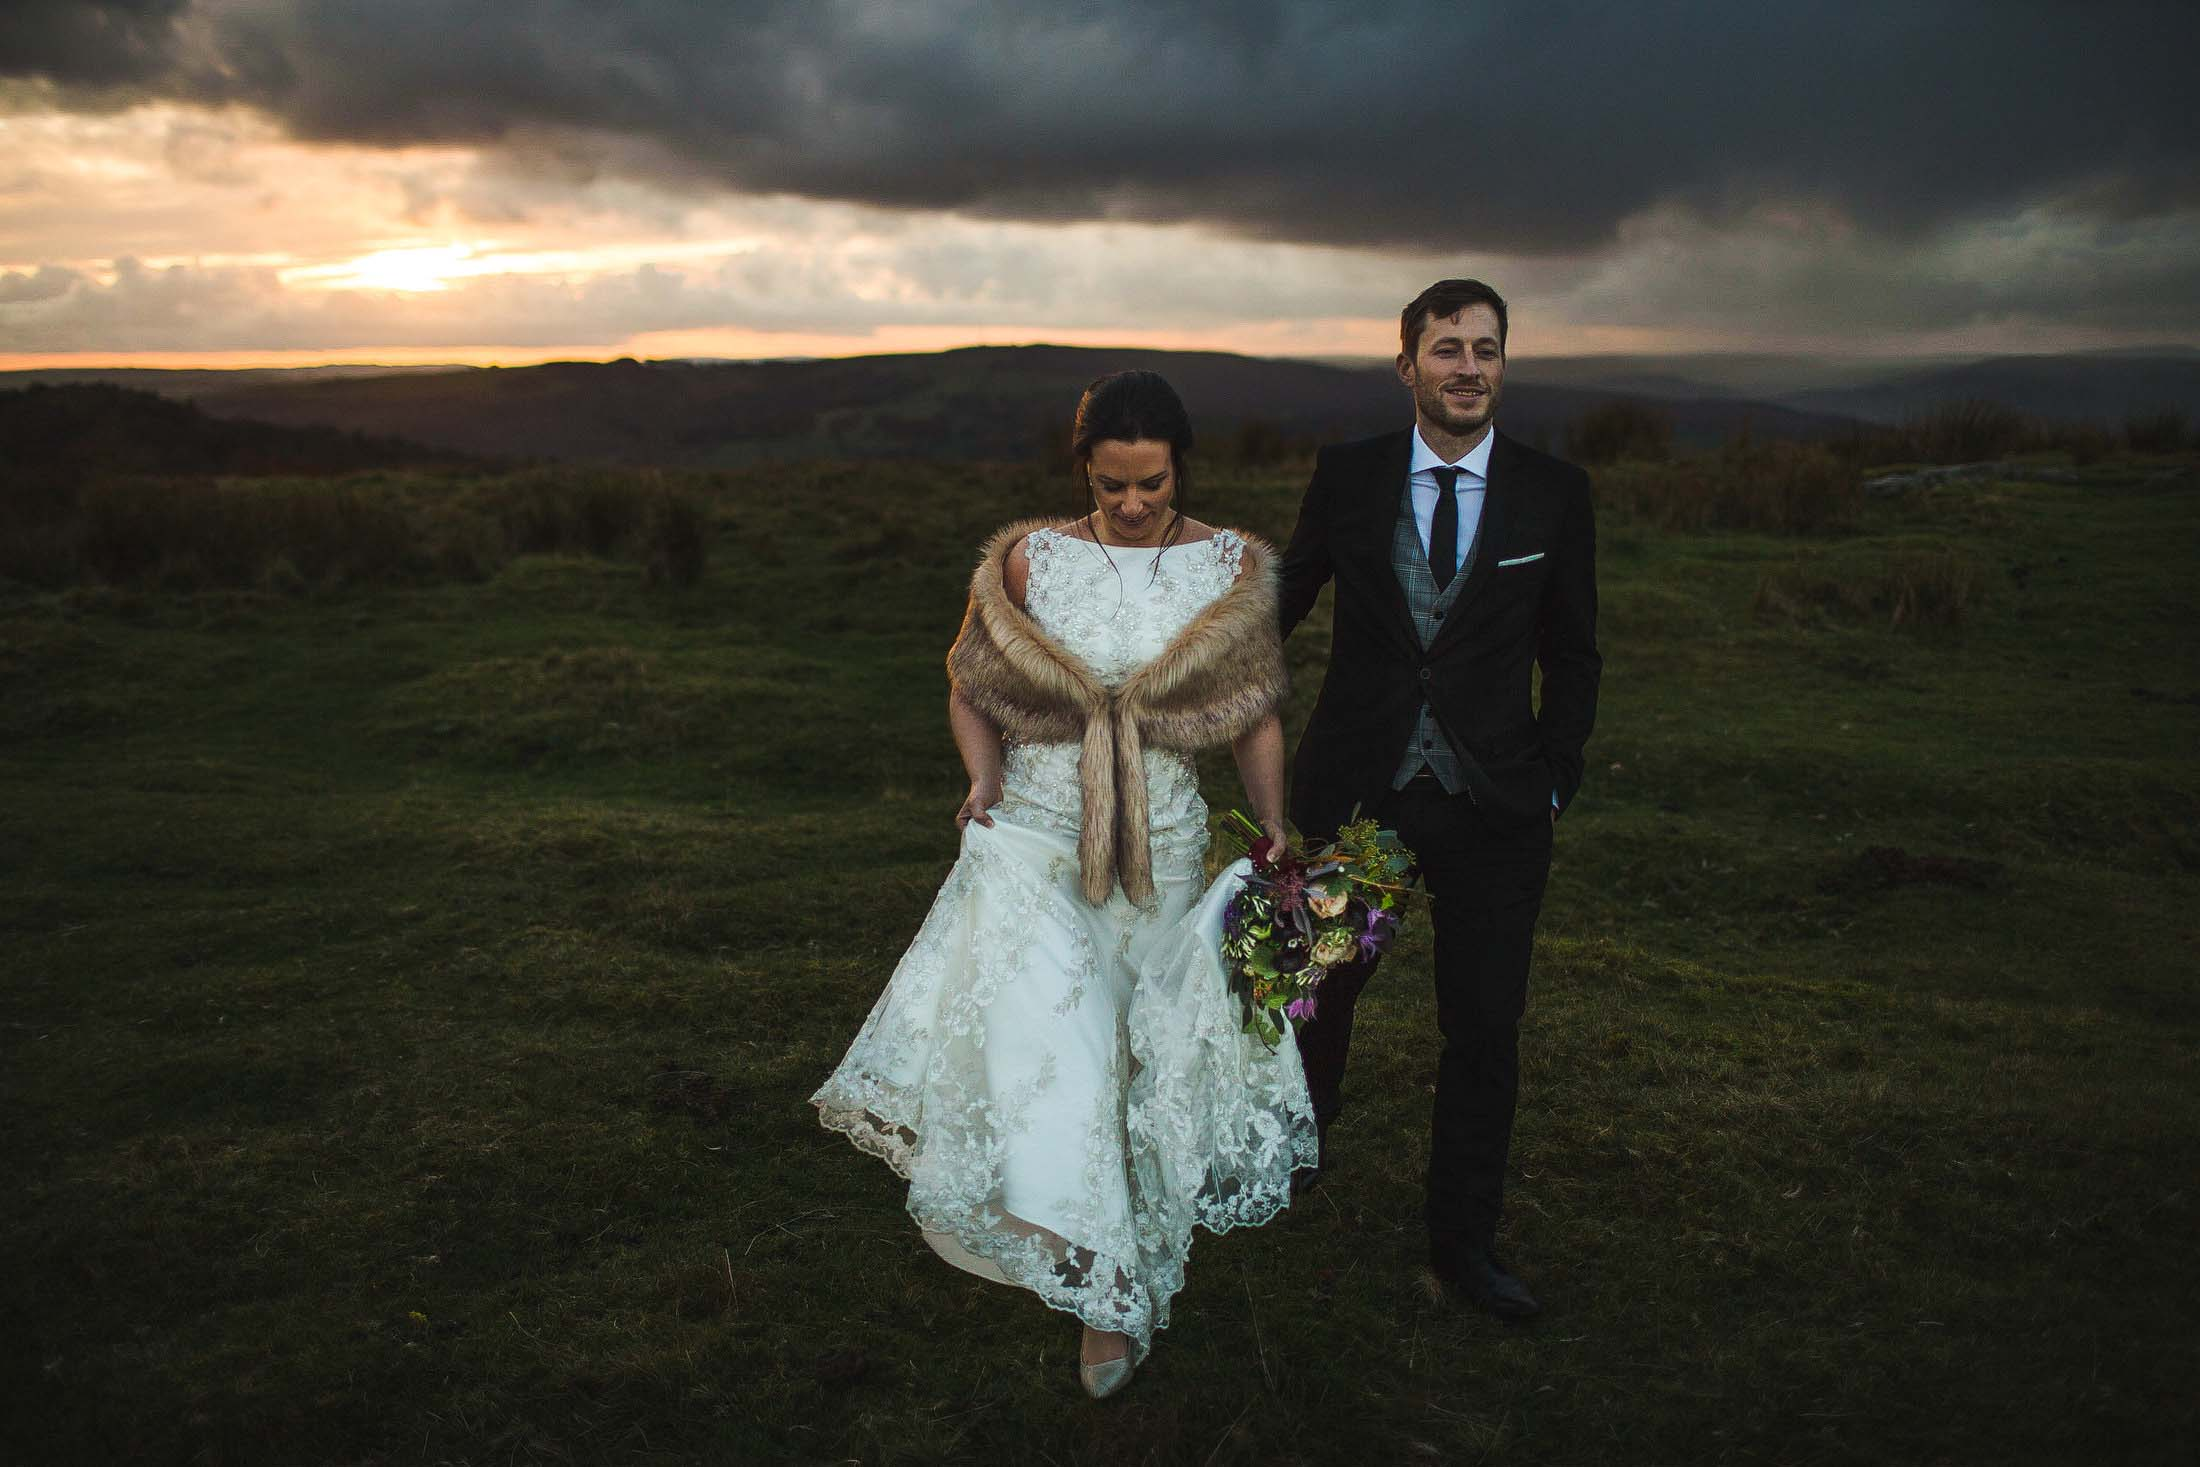 Maynard wedding photographer